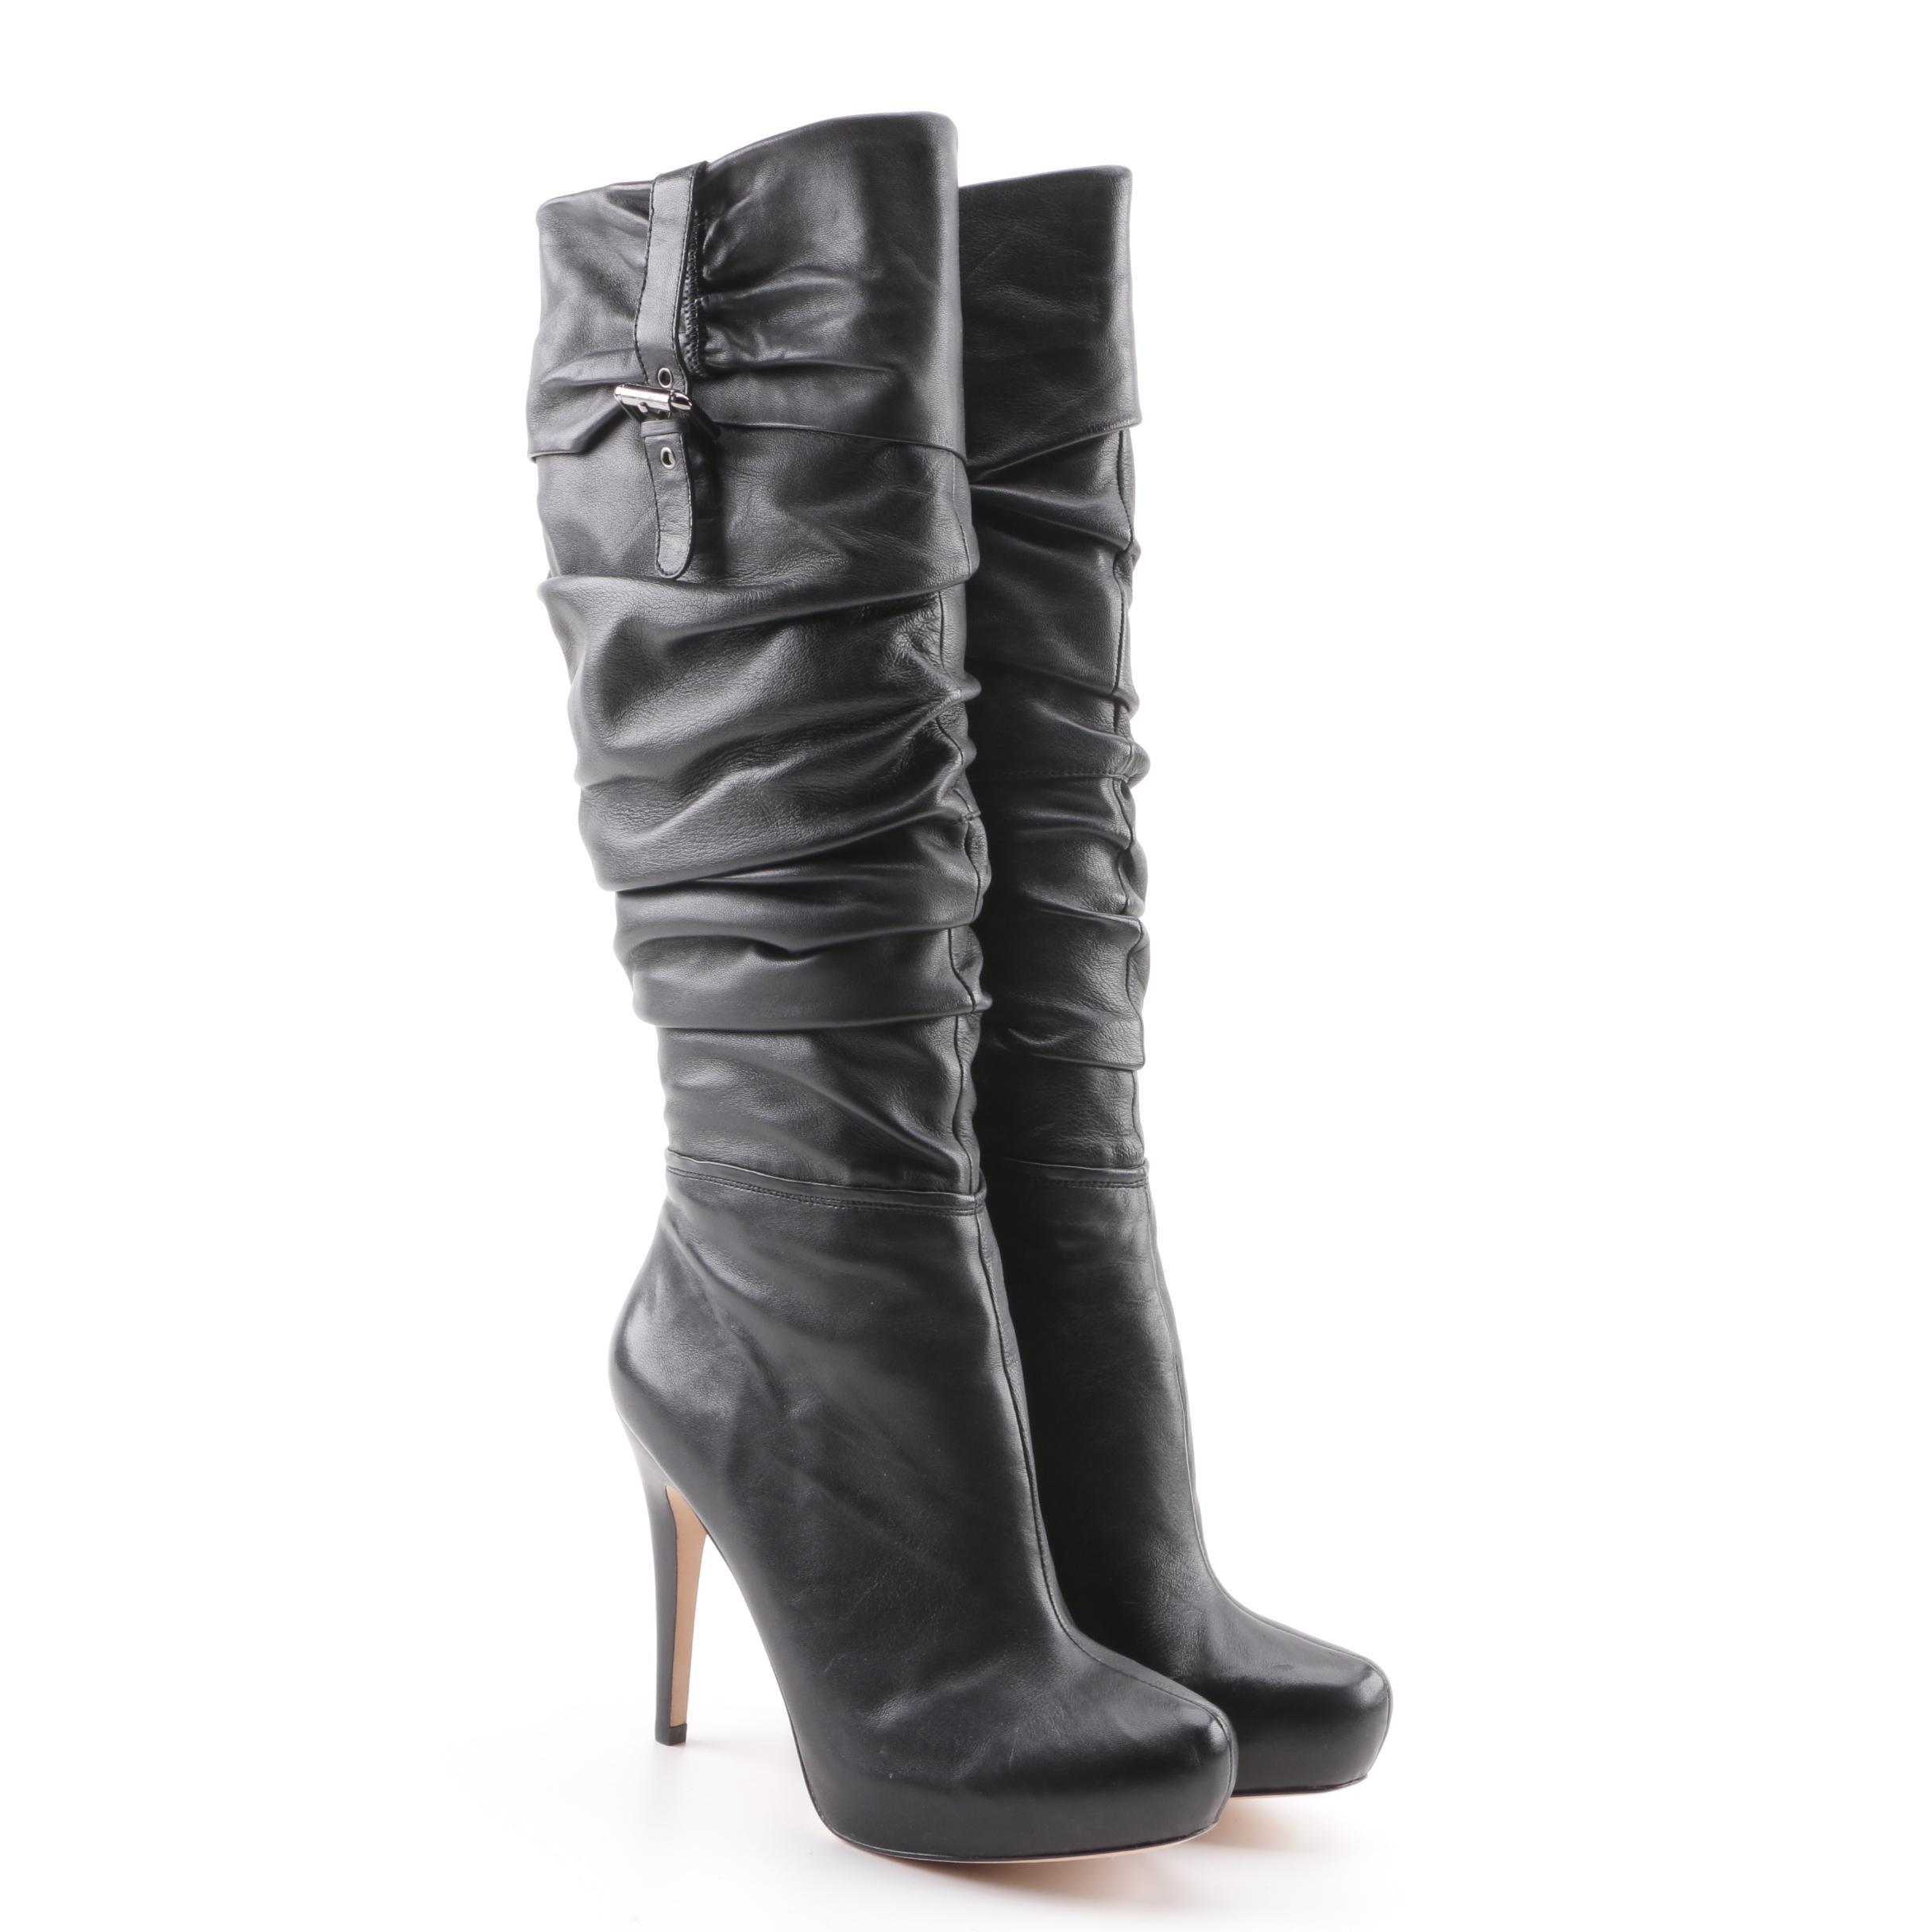 Women's Charles David Black Leather Platform Tall Boots